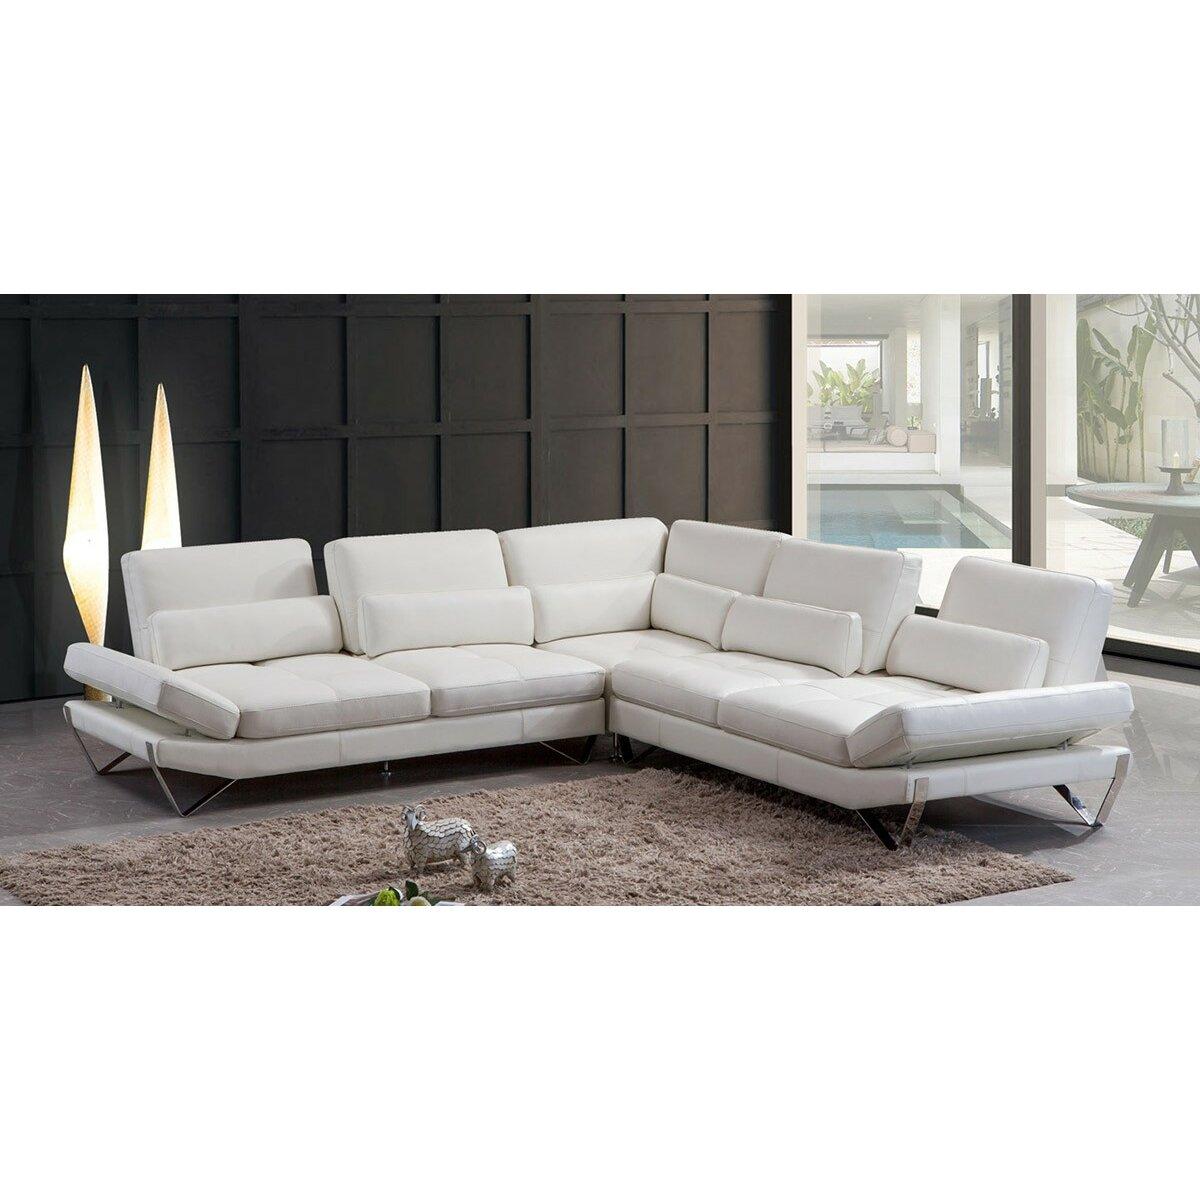 Wade logan northbridge leather sectional wayfair for White sectional sofa wayfair